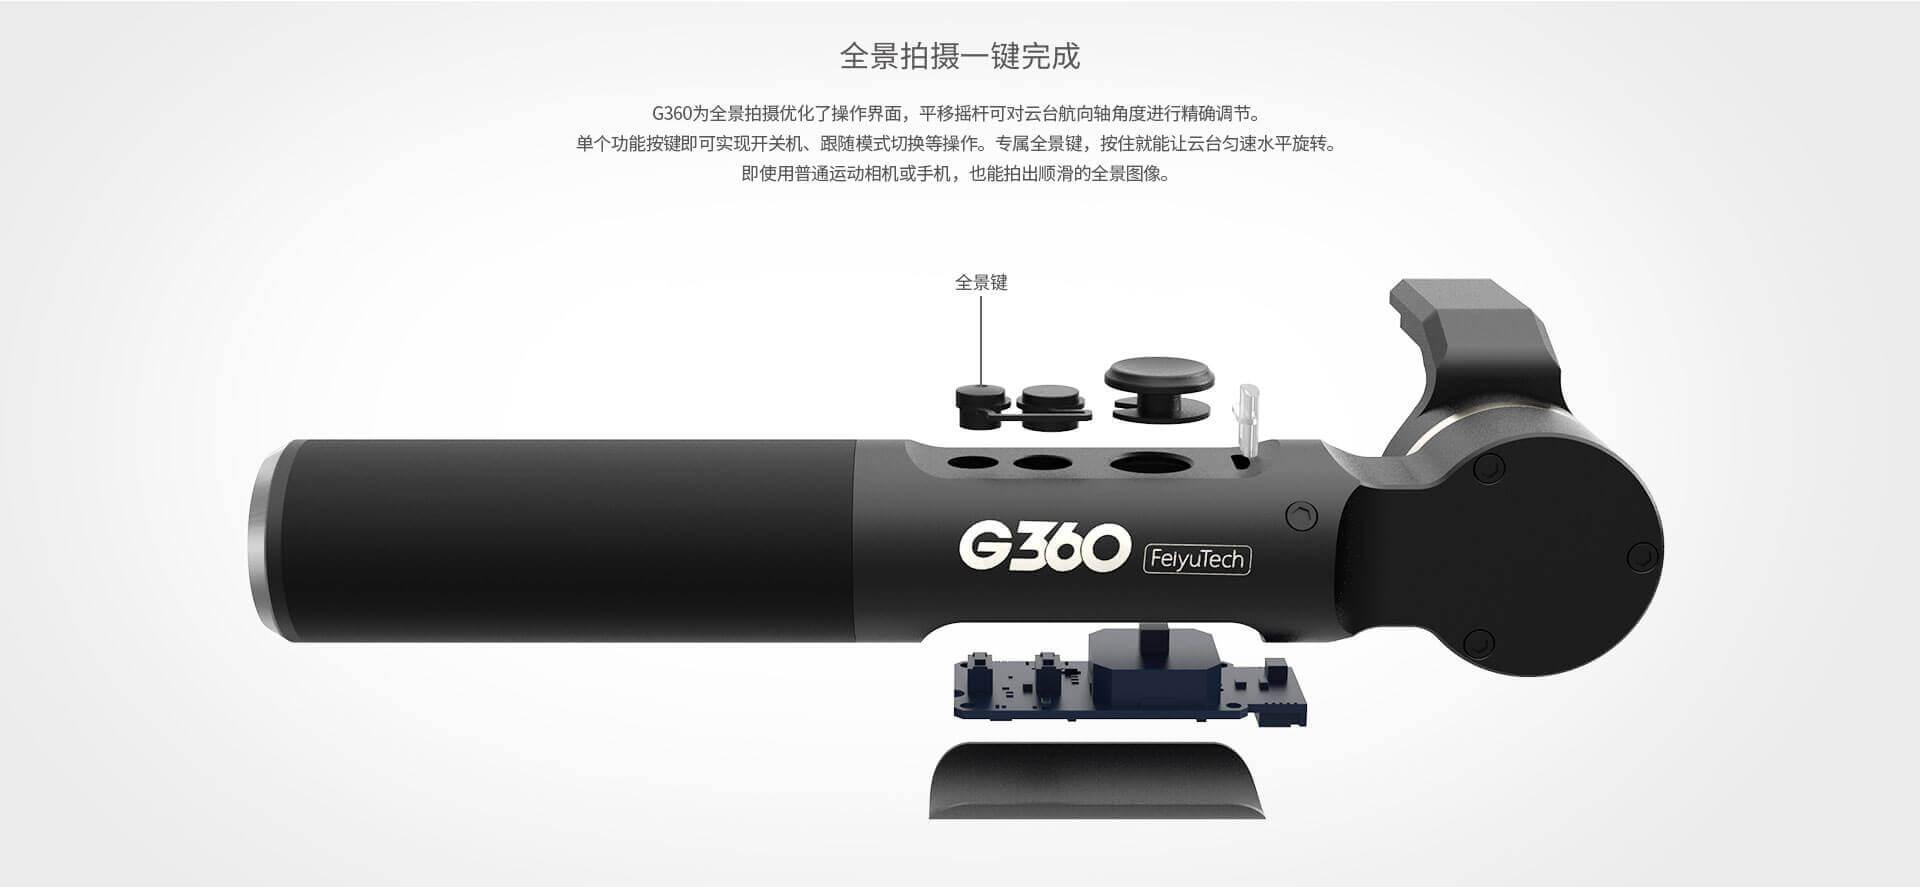 G360_10.jpg